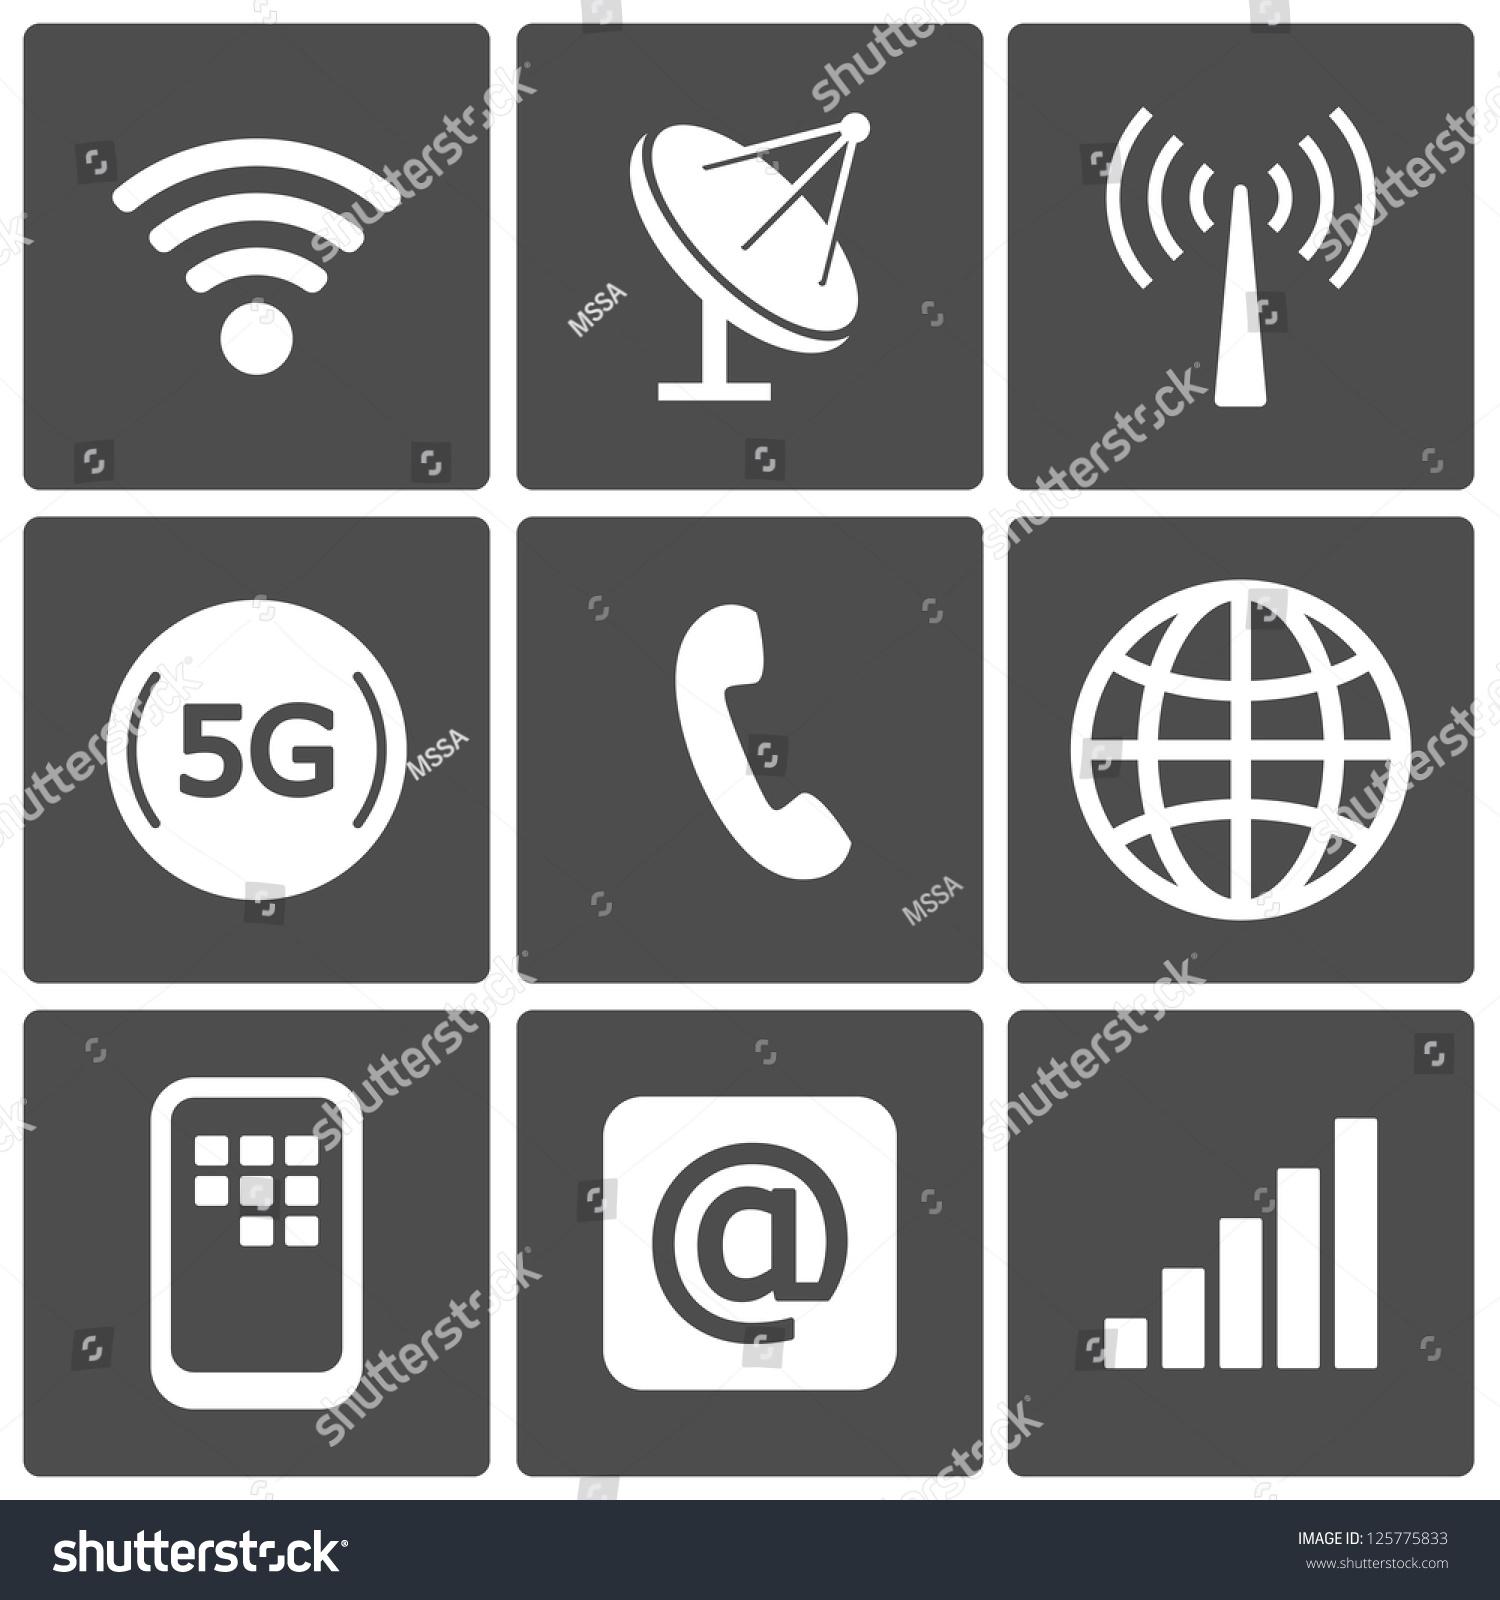 Communication Icons Connection Symbols Wifi Gsm Stock Photo (Photo ...